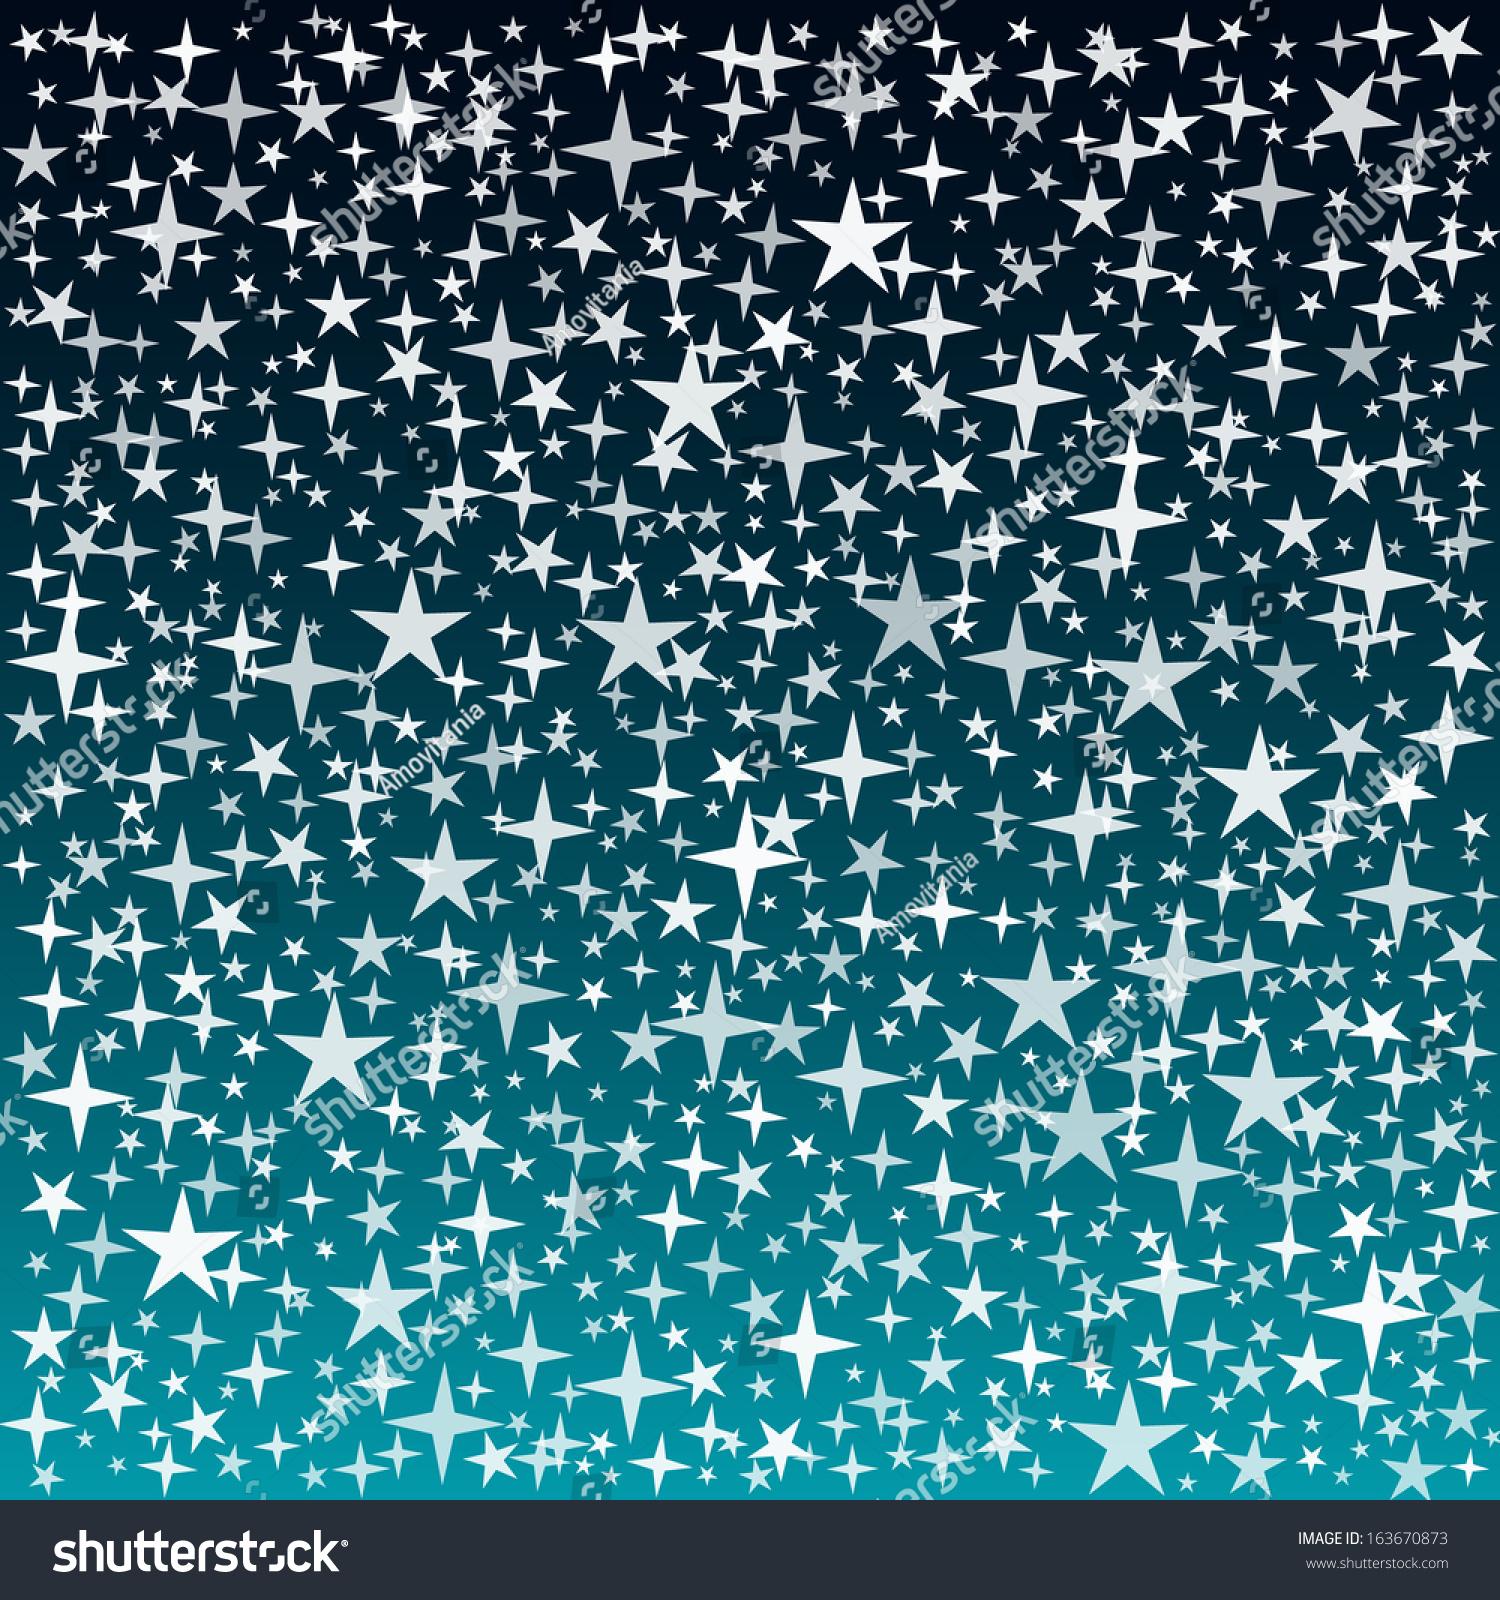 Silver Stars DolceModz-Star